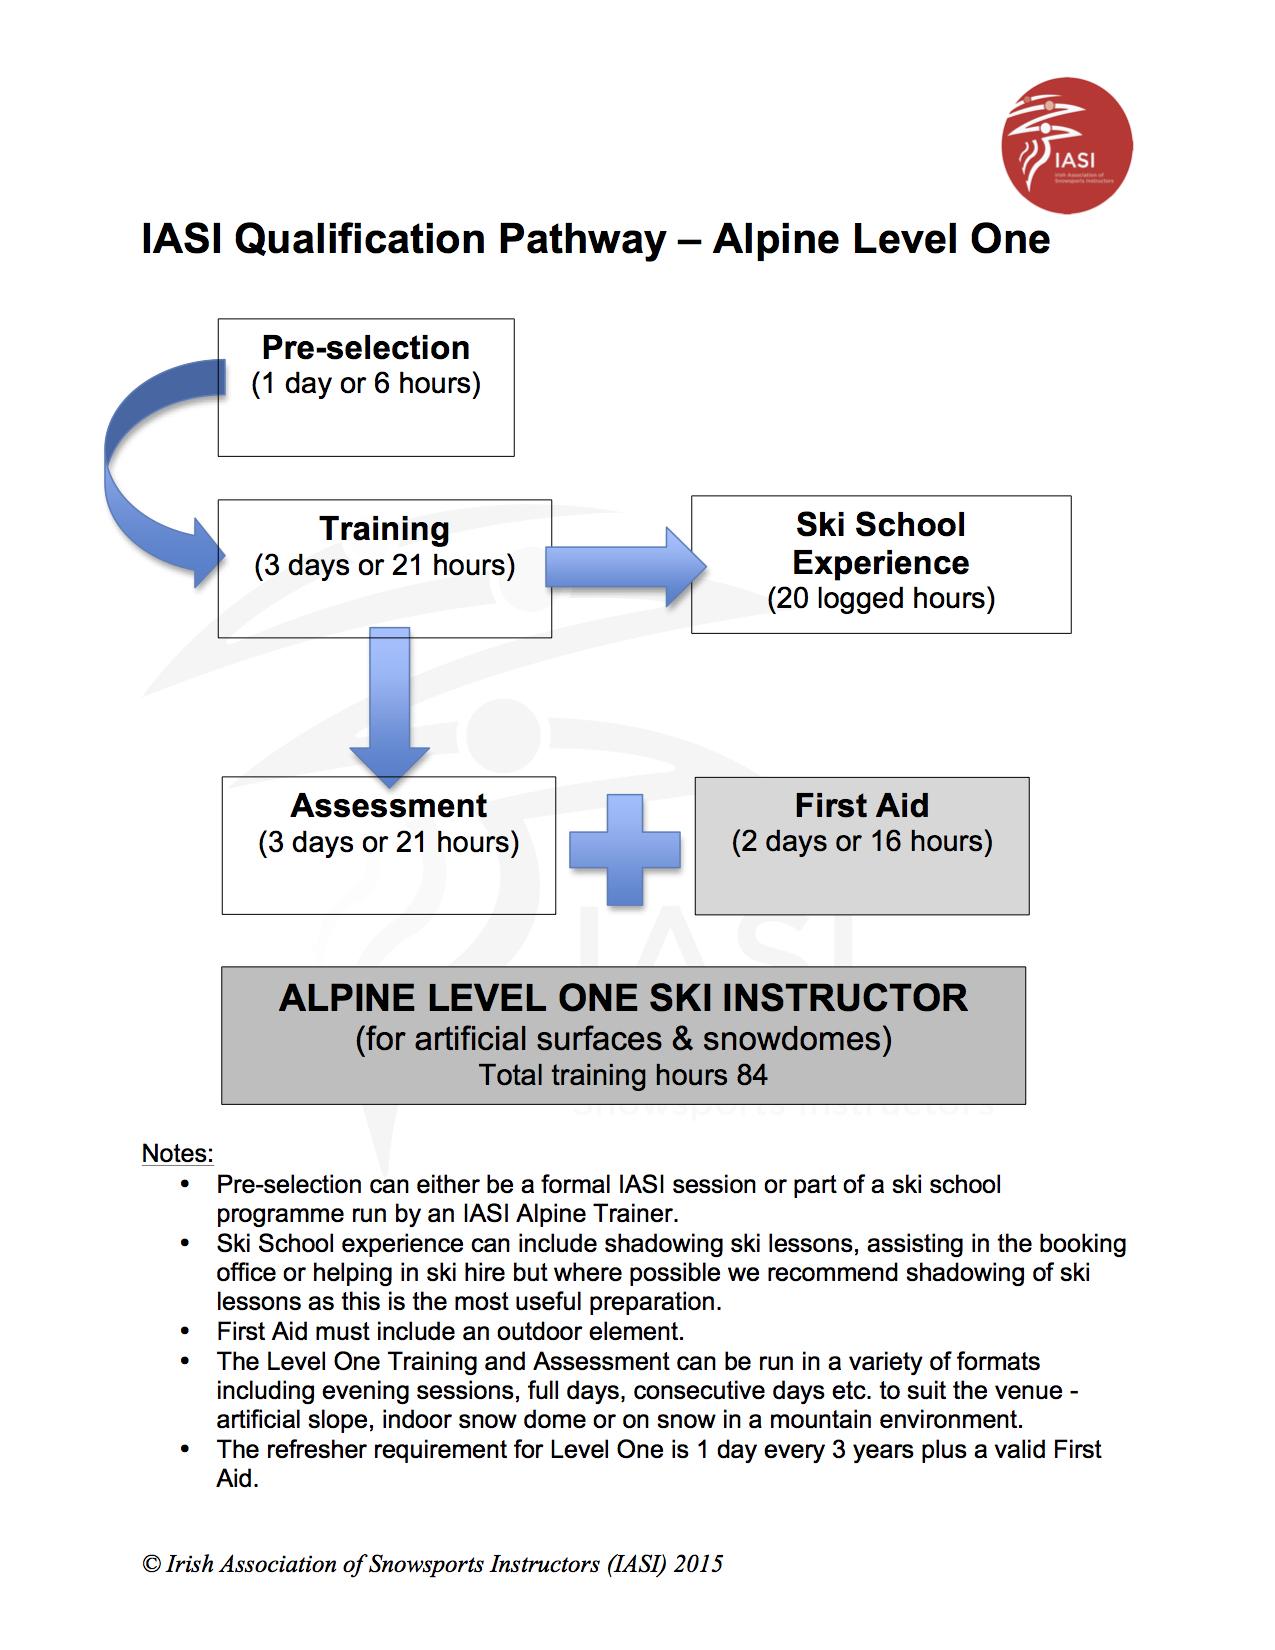 IASI Qualification Pathway Alpine Level 1